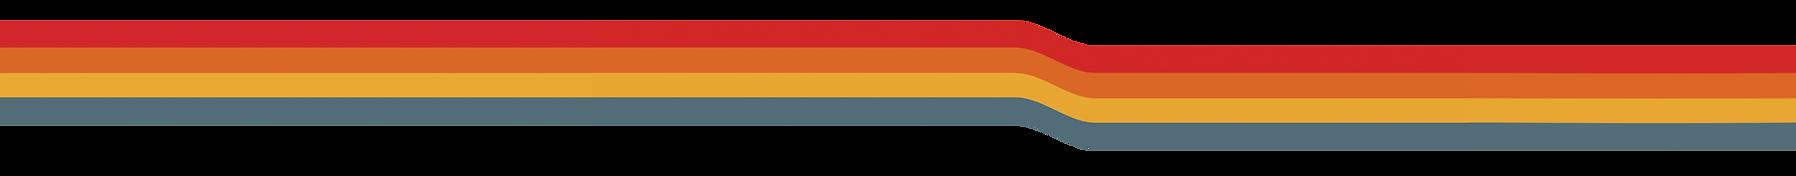 LargeVandoit-Stripe%20copy_edited.png